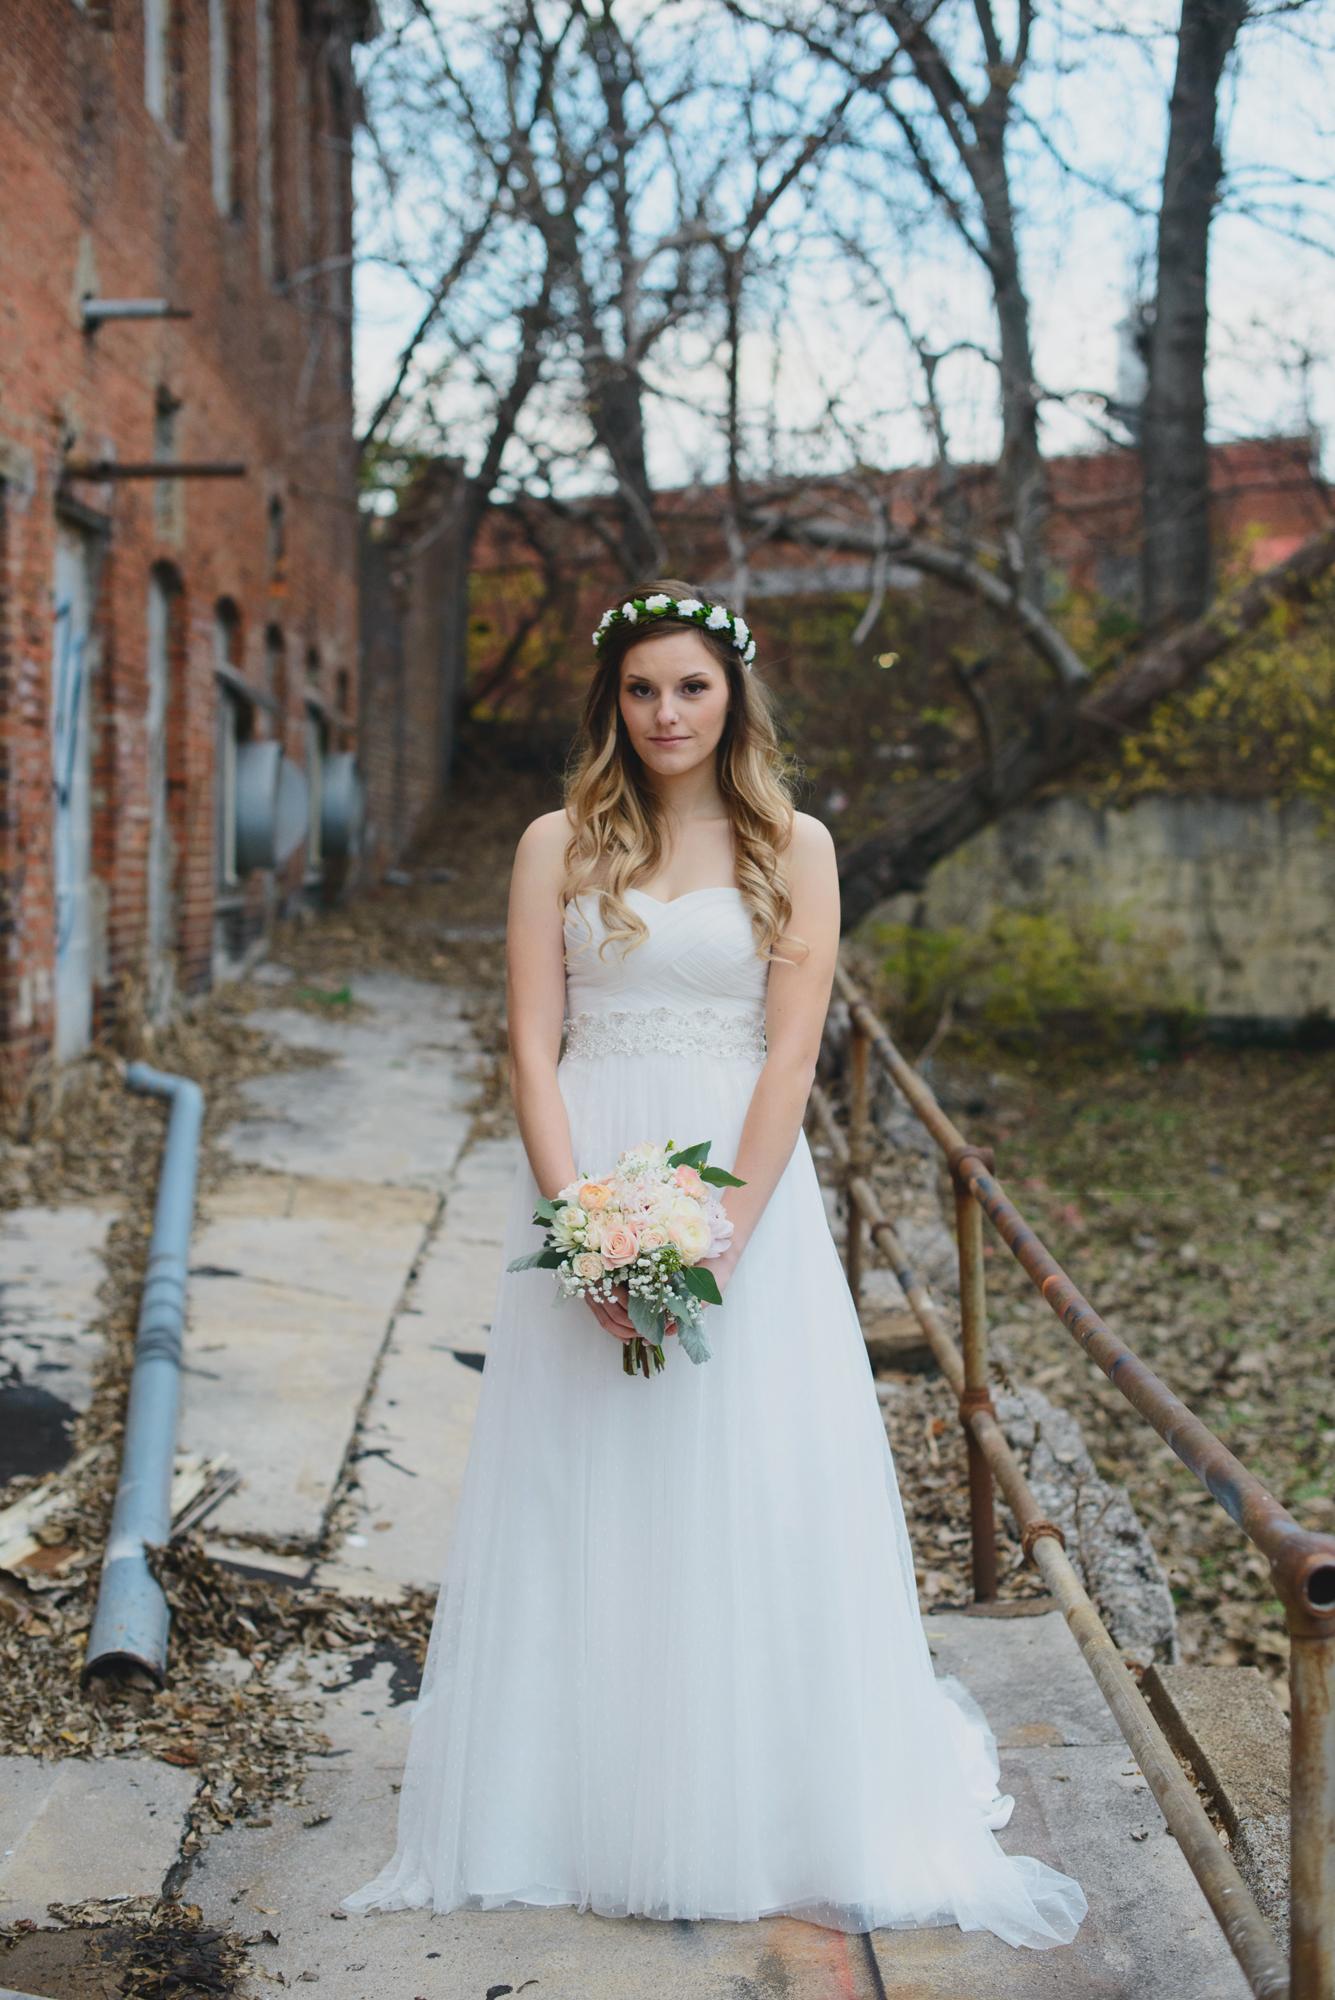 KimberlyManning_Wedding_Faves092.jpg